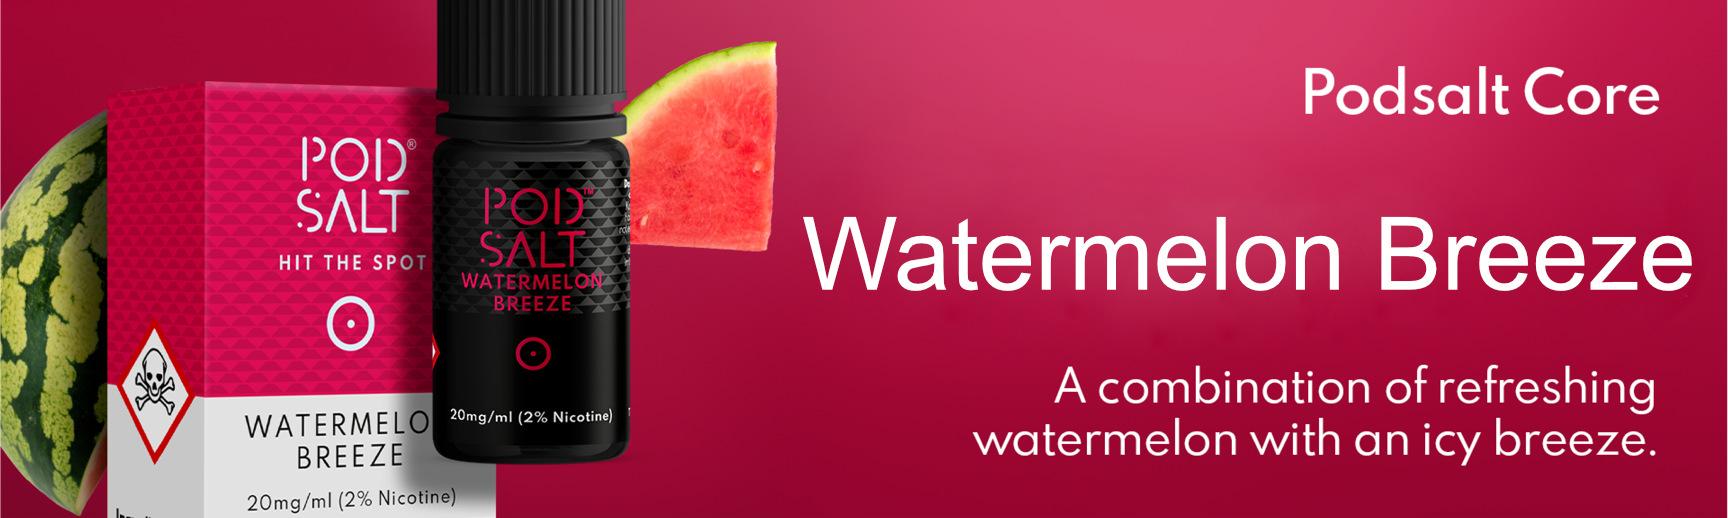 watermelon-breeze-pod-salt-vapetime-uk.jpg